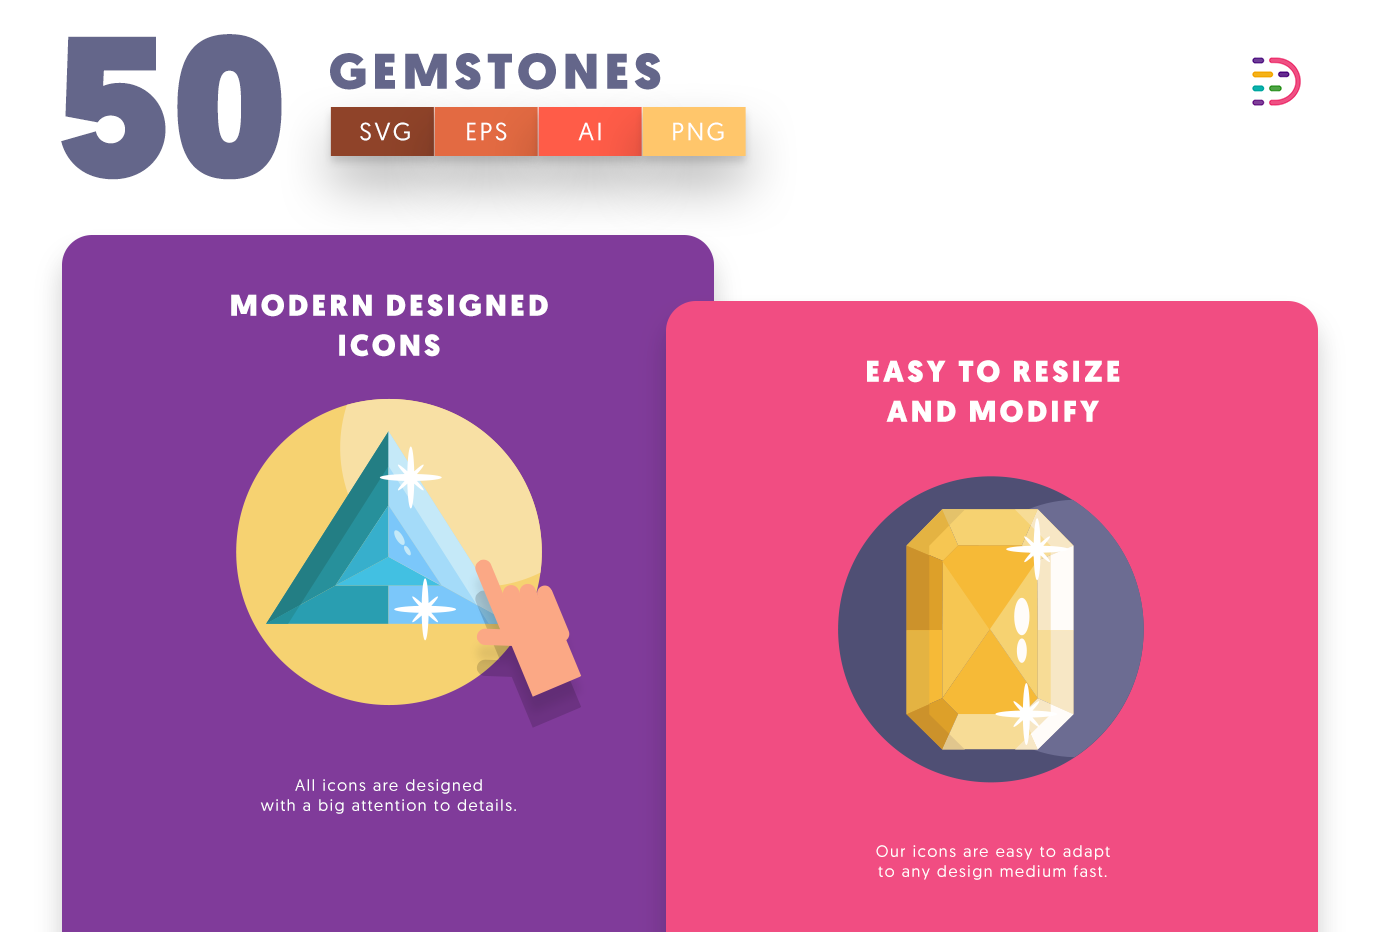 Gemstones icons png/svg/eps